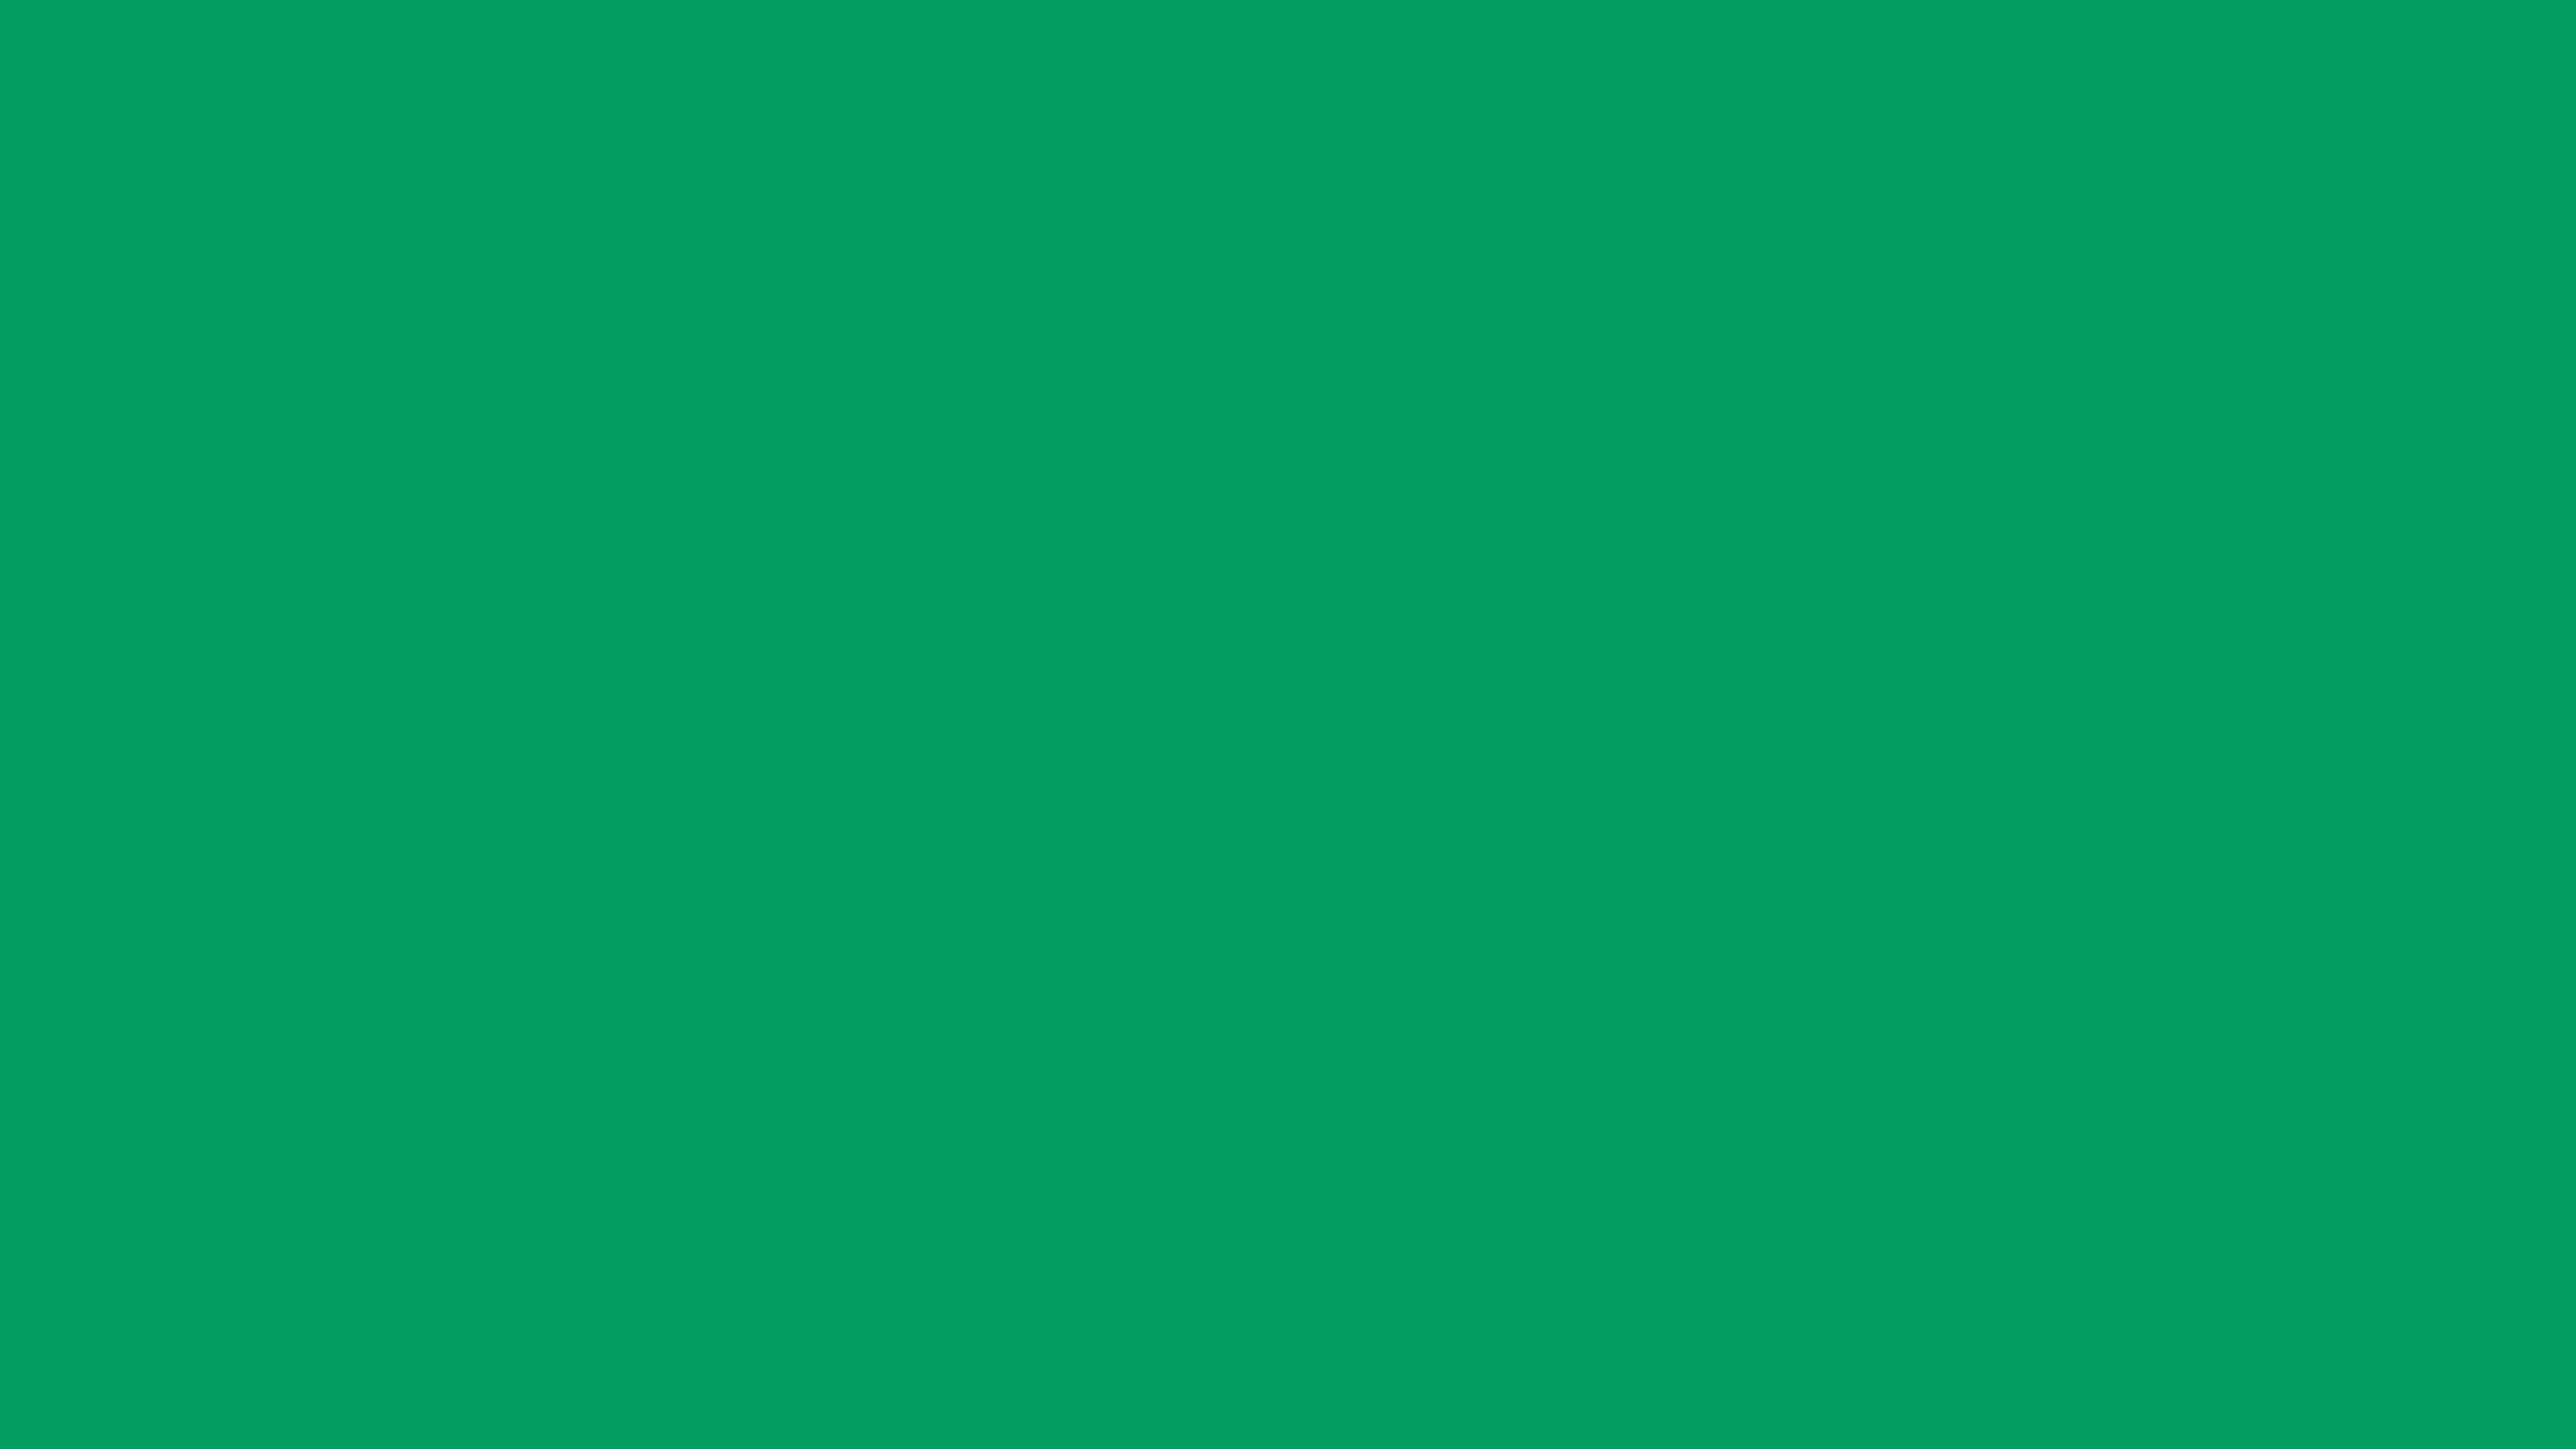 7680x4320 Shamrock Green Solid Color Background